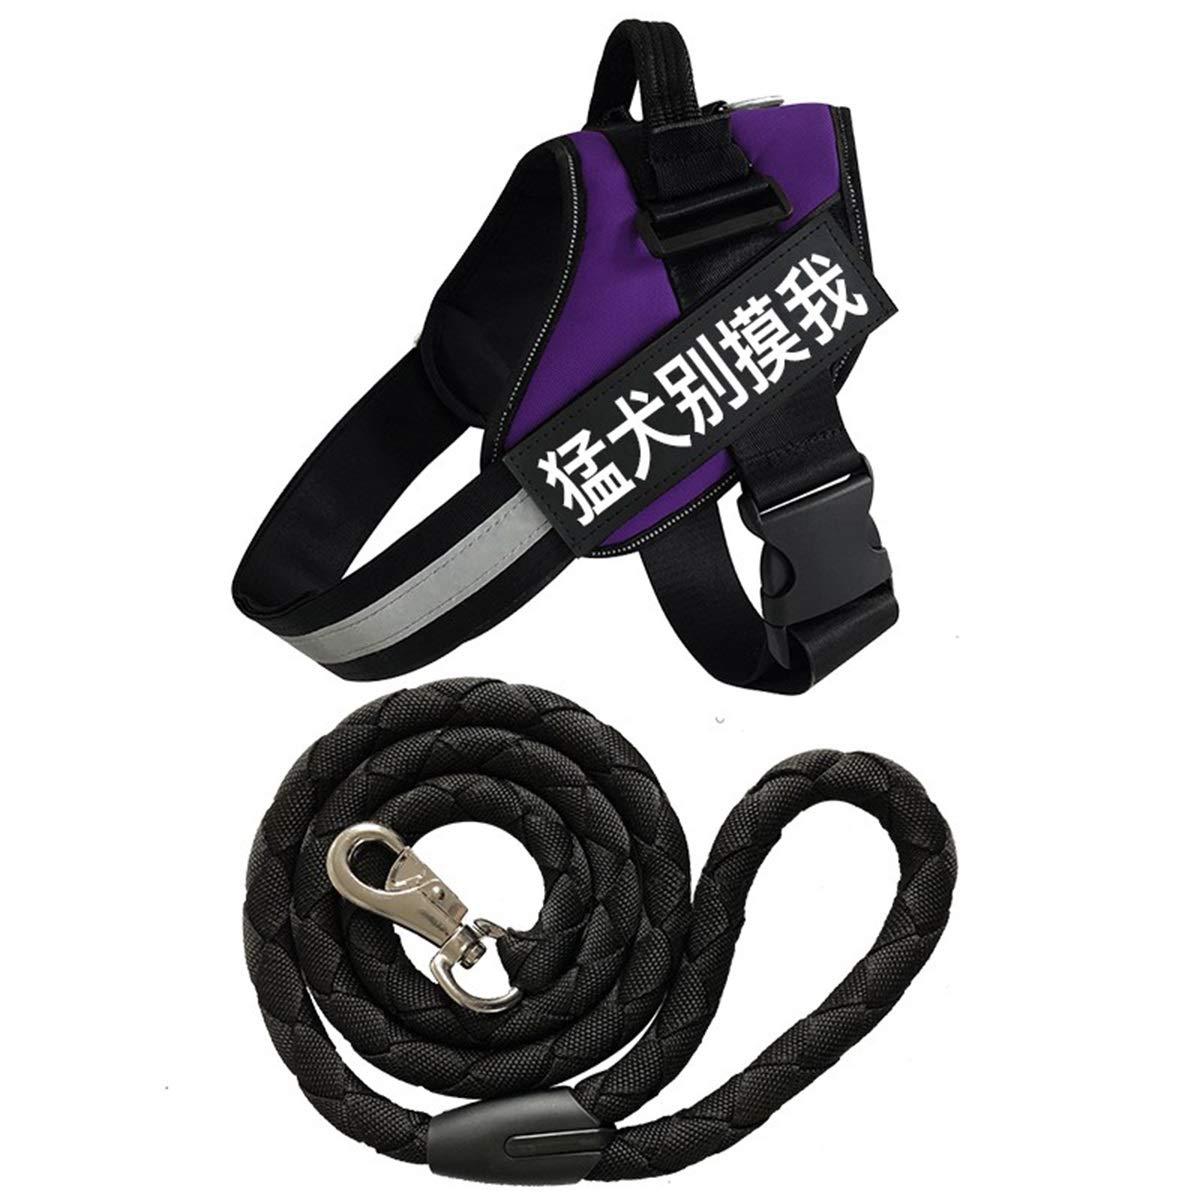 Purple S Purple S Vest-Style Mastiff Dog Leash, Labrador golden Retriever Small Medium Large Dog Chain, Chest Strap K9, Hand-Woven Rope, Vest Chest Strap 2 Piece Set, 6 colors, 6 Sizes Free to Choose